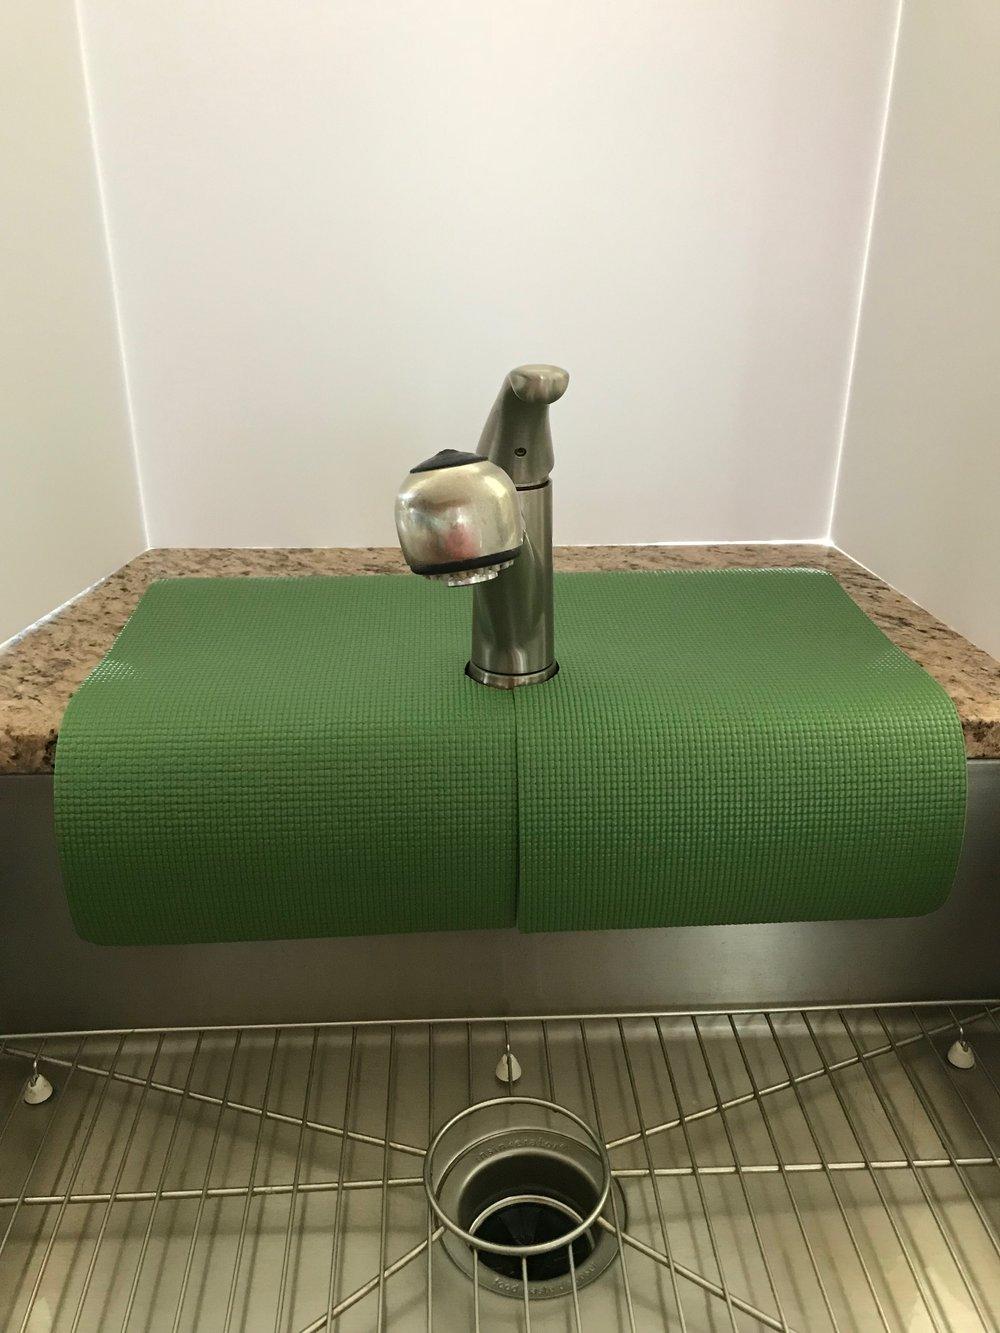 Olive Green Kitchen Sink Faucet Splash Guard, guards faucet area ...